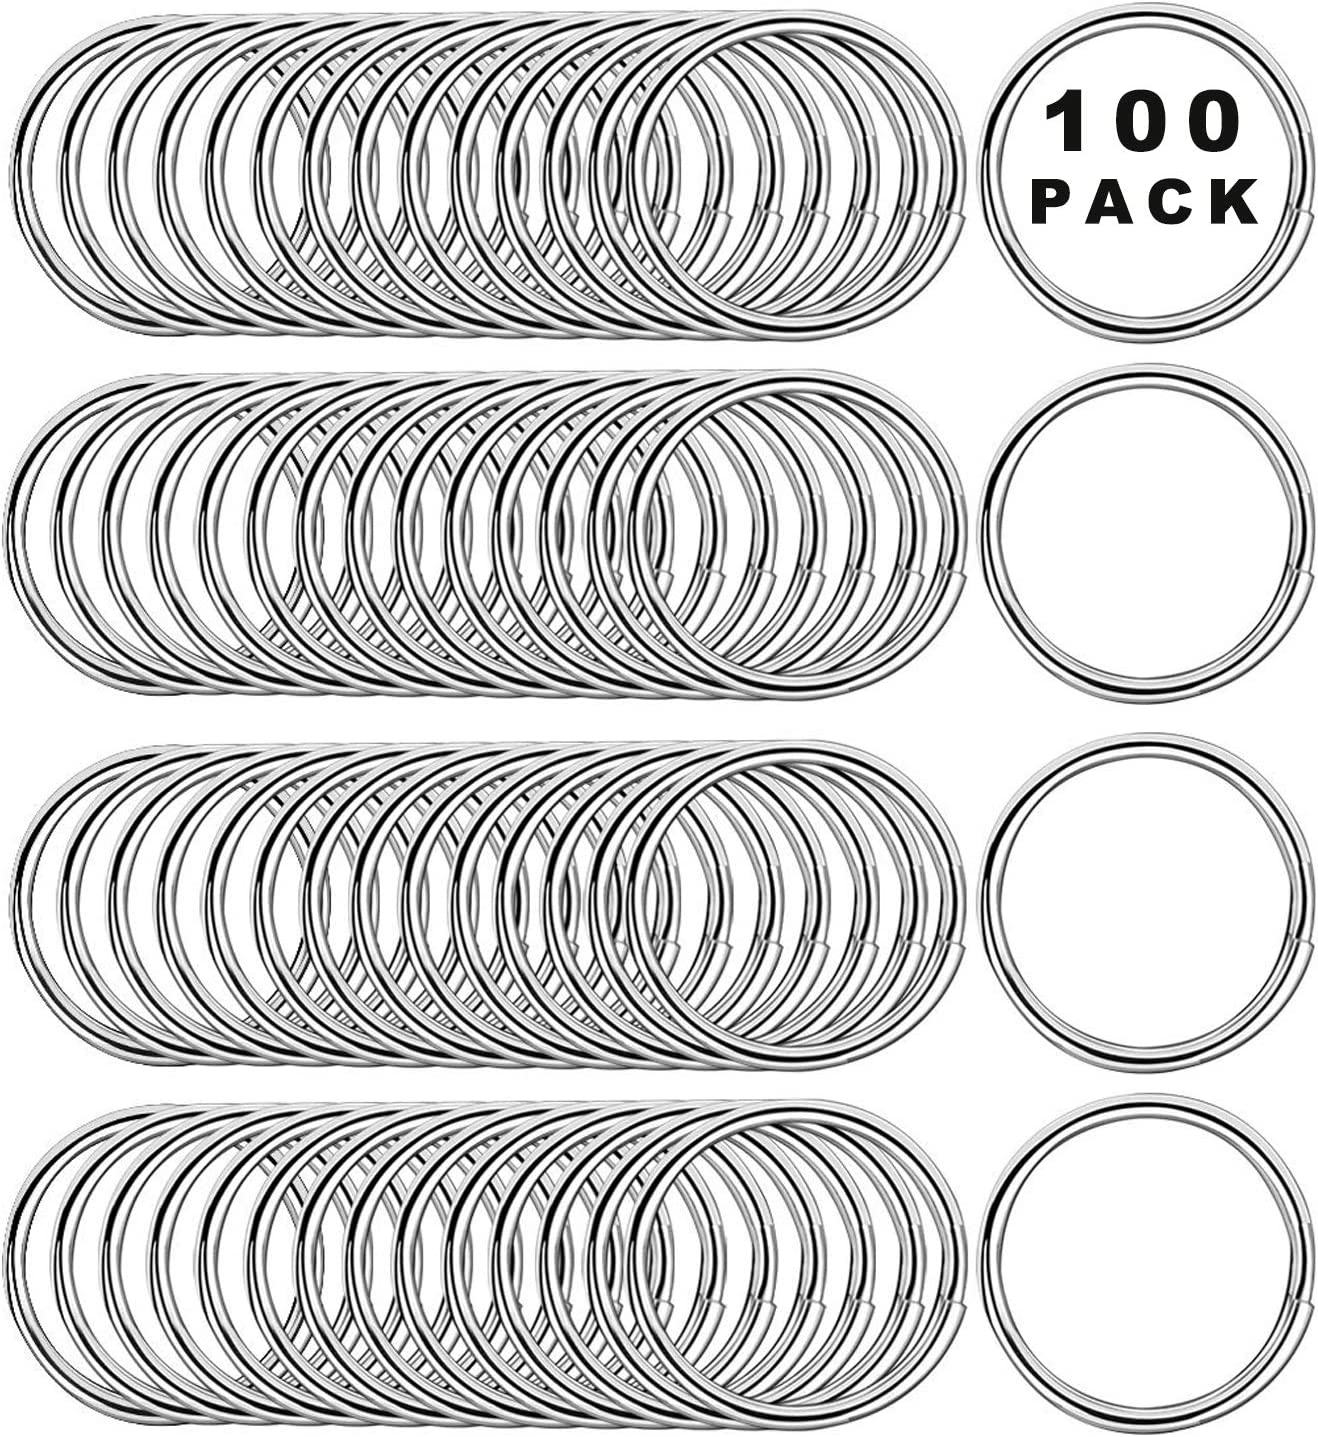 Anillo de Llavero Redondo 25mm,anillas de llavero de acero inoxidable,anillos partidos de metal,anillas llaveros para Organización de Llaves